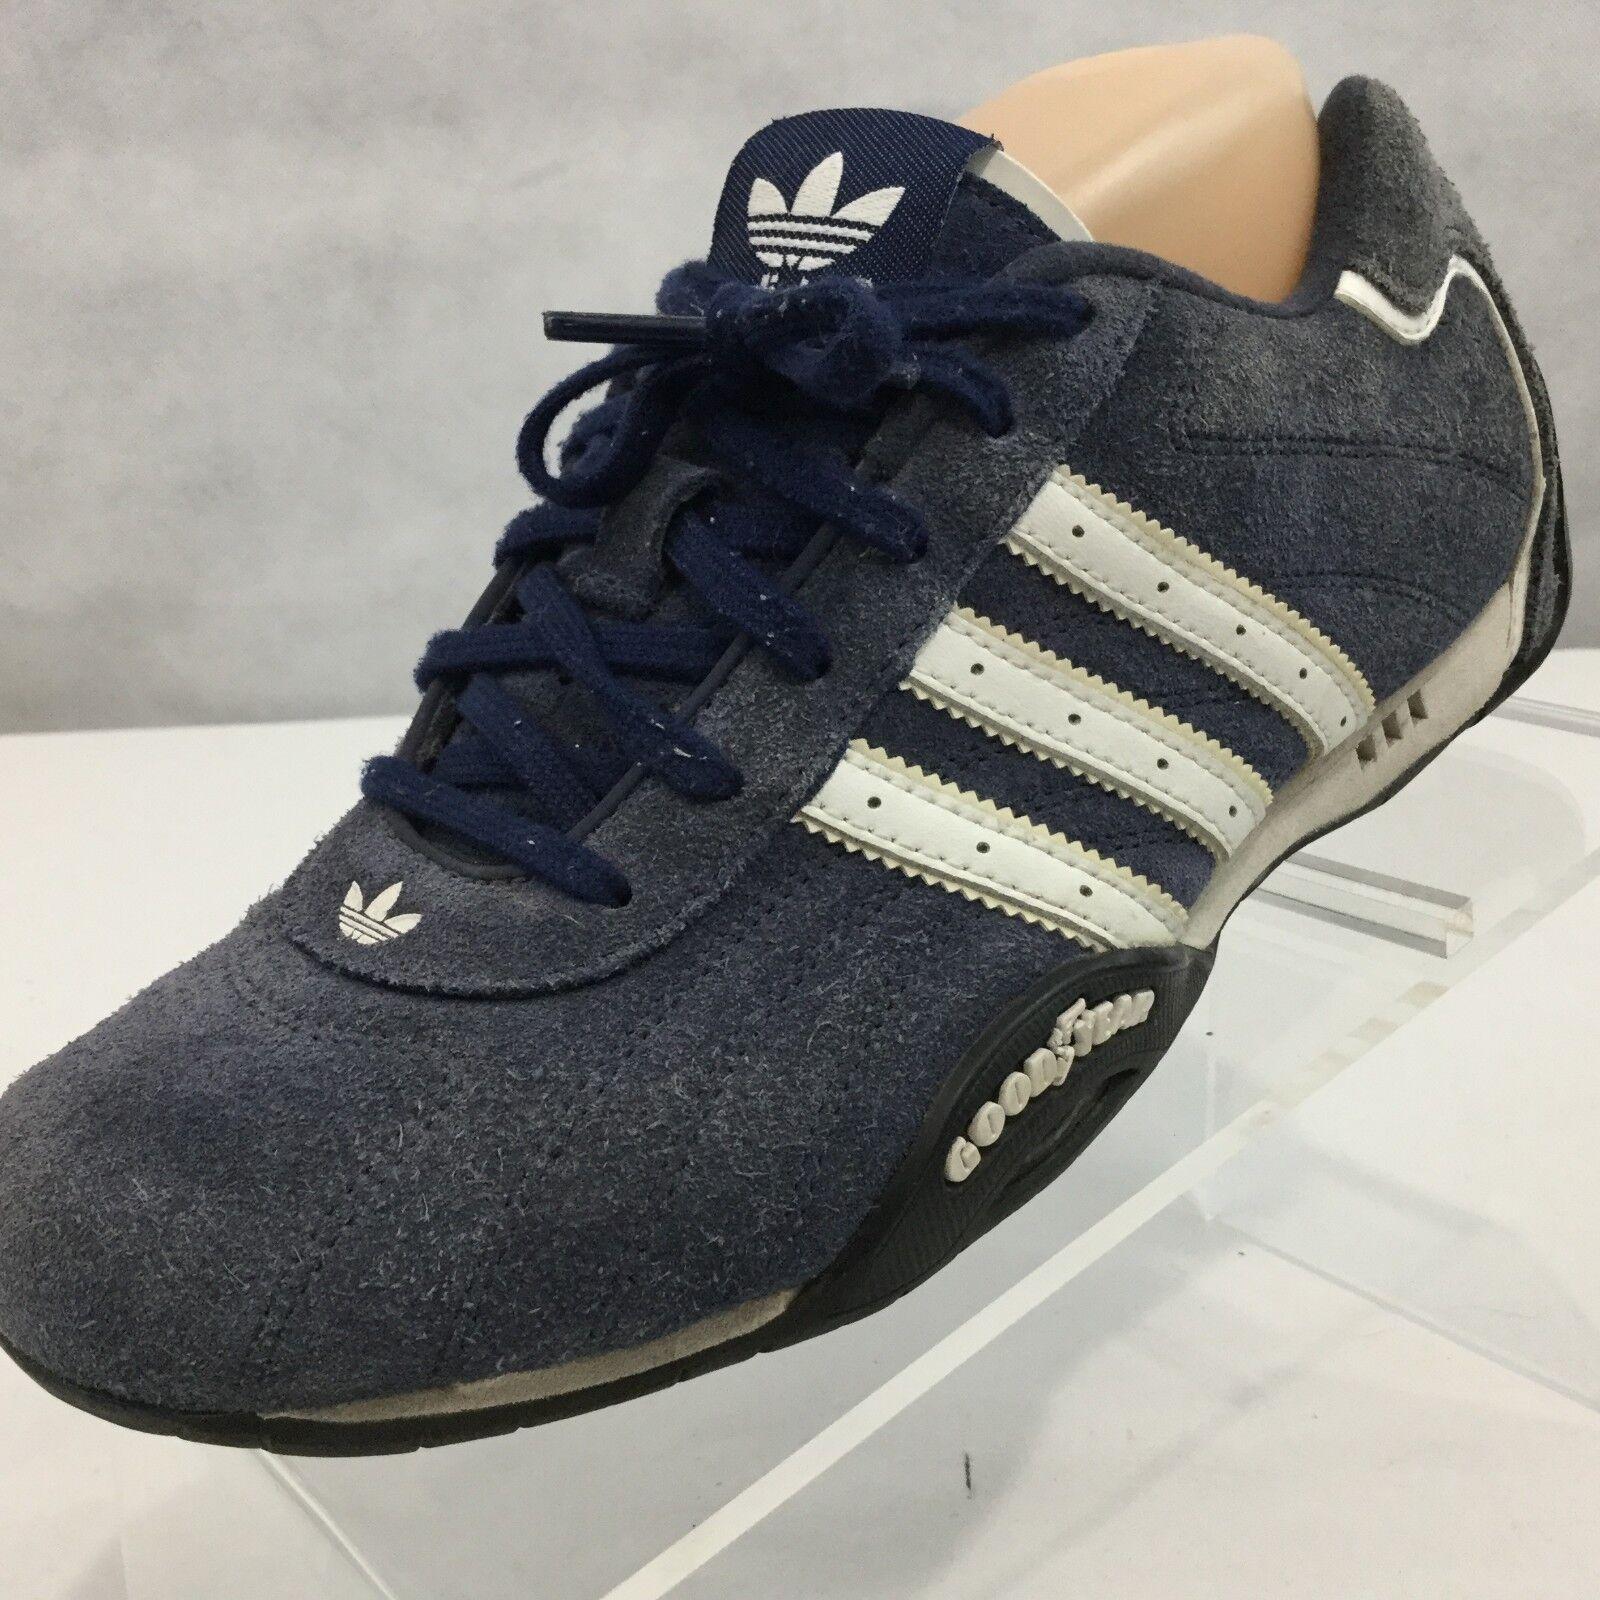 Vtg Adidas Adi Racer Goodyear Driving Shoes Sz 5 Blue Leather Trefoil 3 Stripes